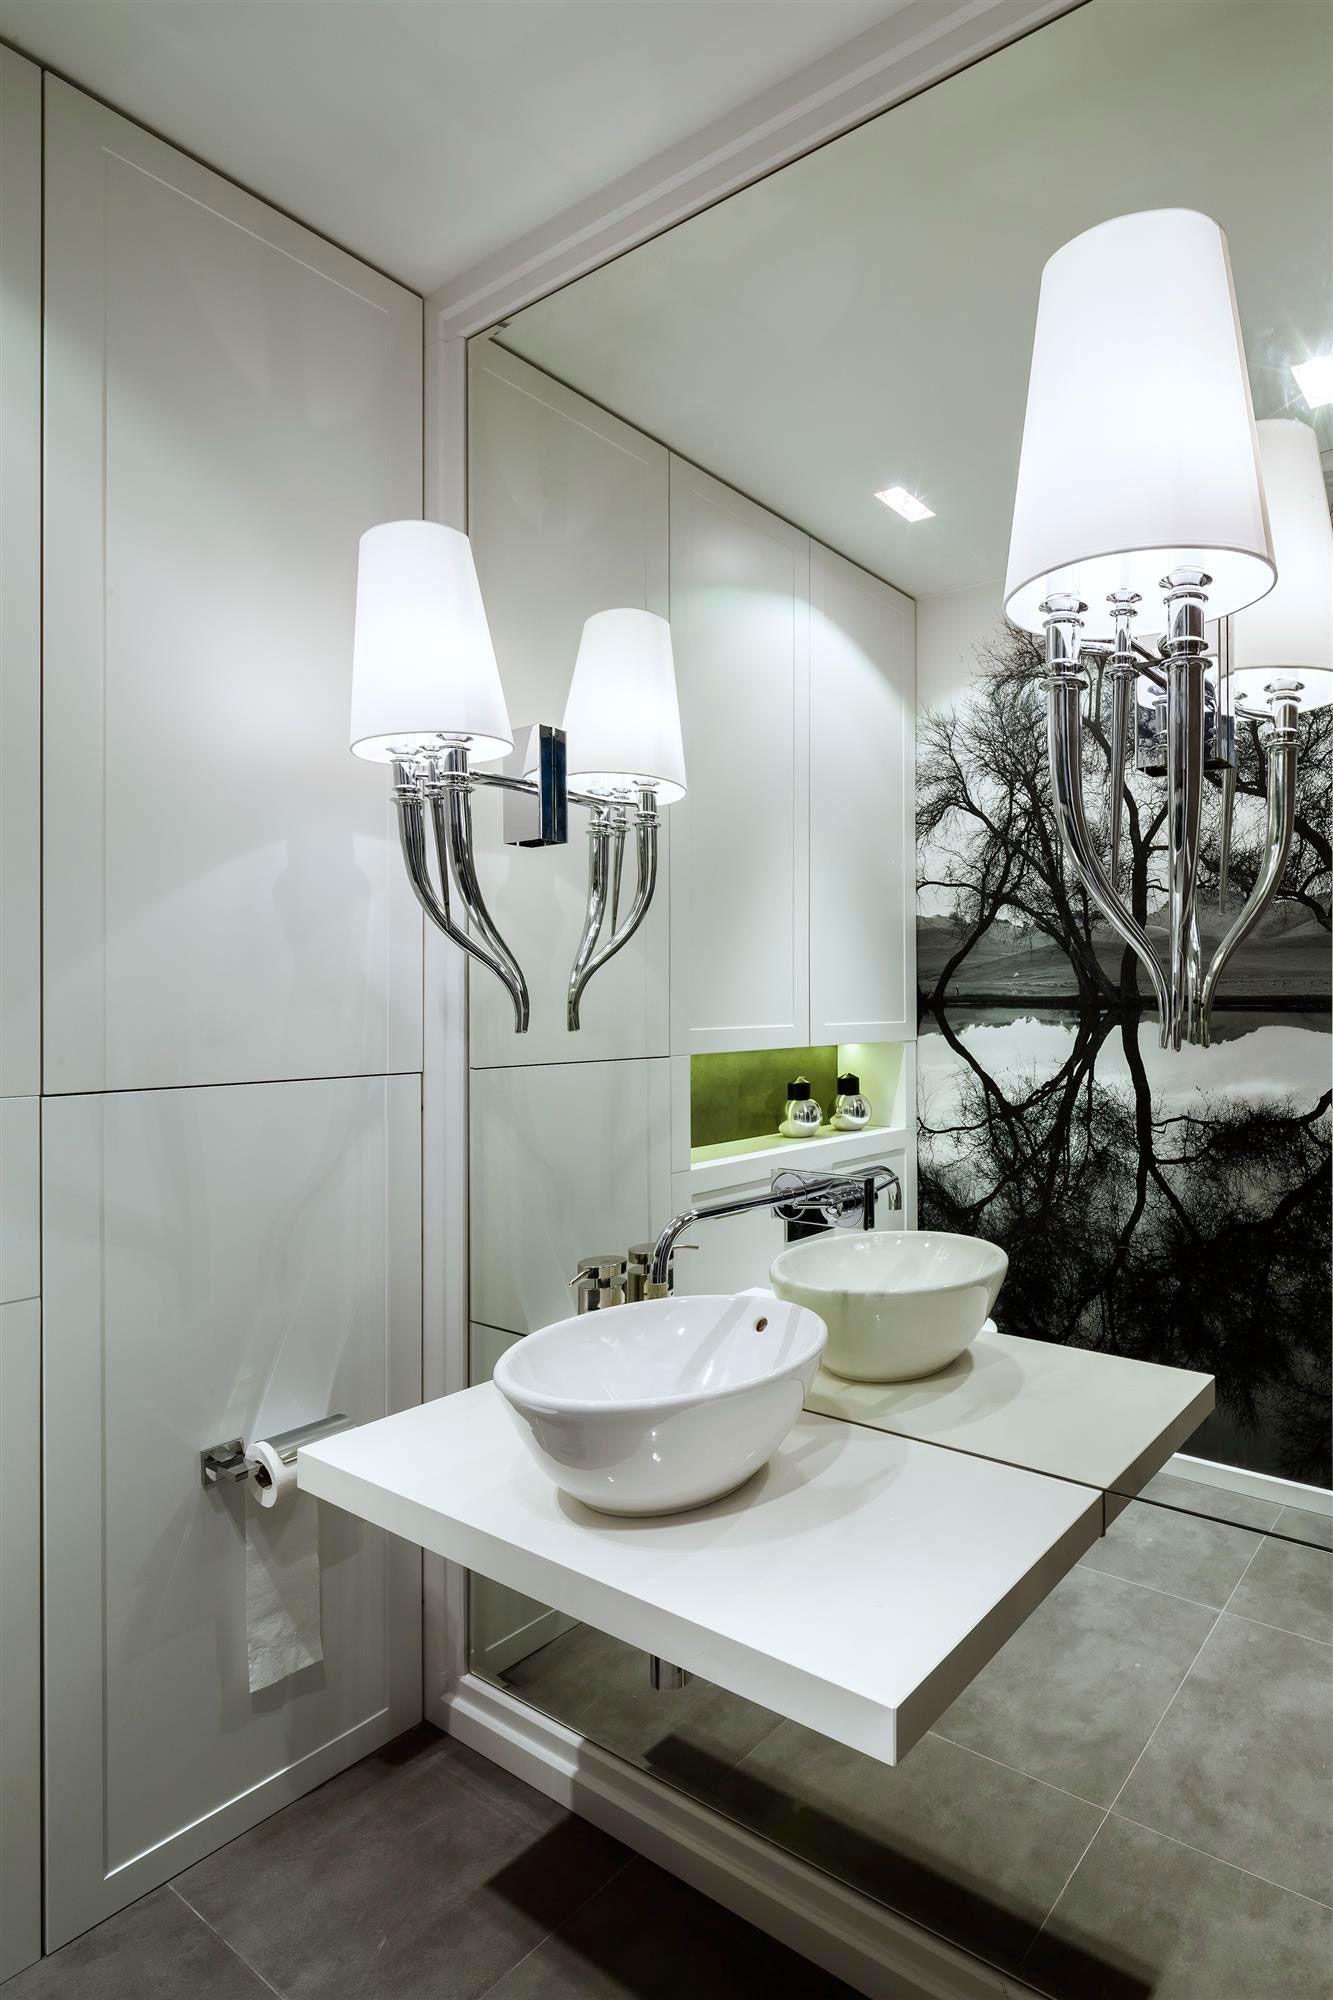 Apartment-in-Warsaw-22 | Diy bathroom decor, Amazing ...